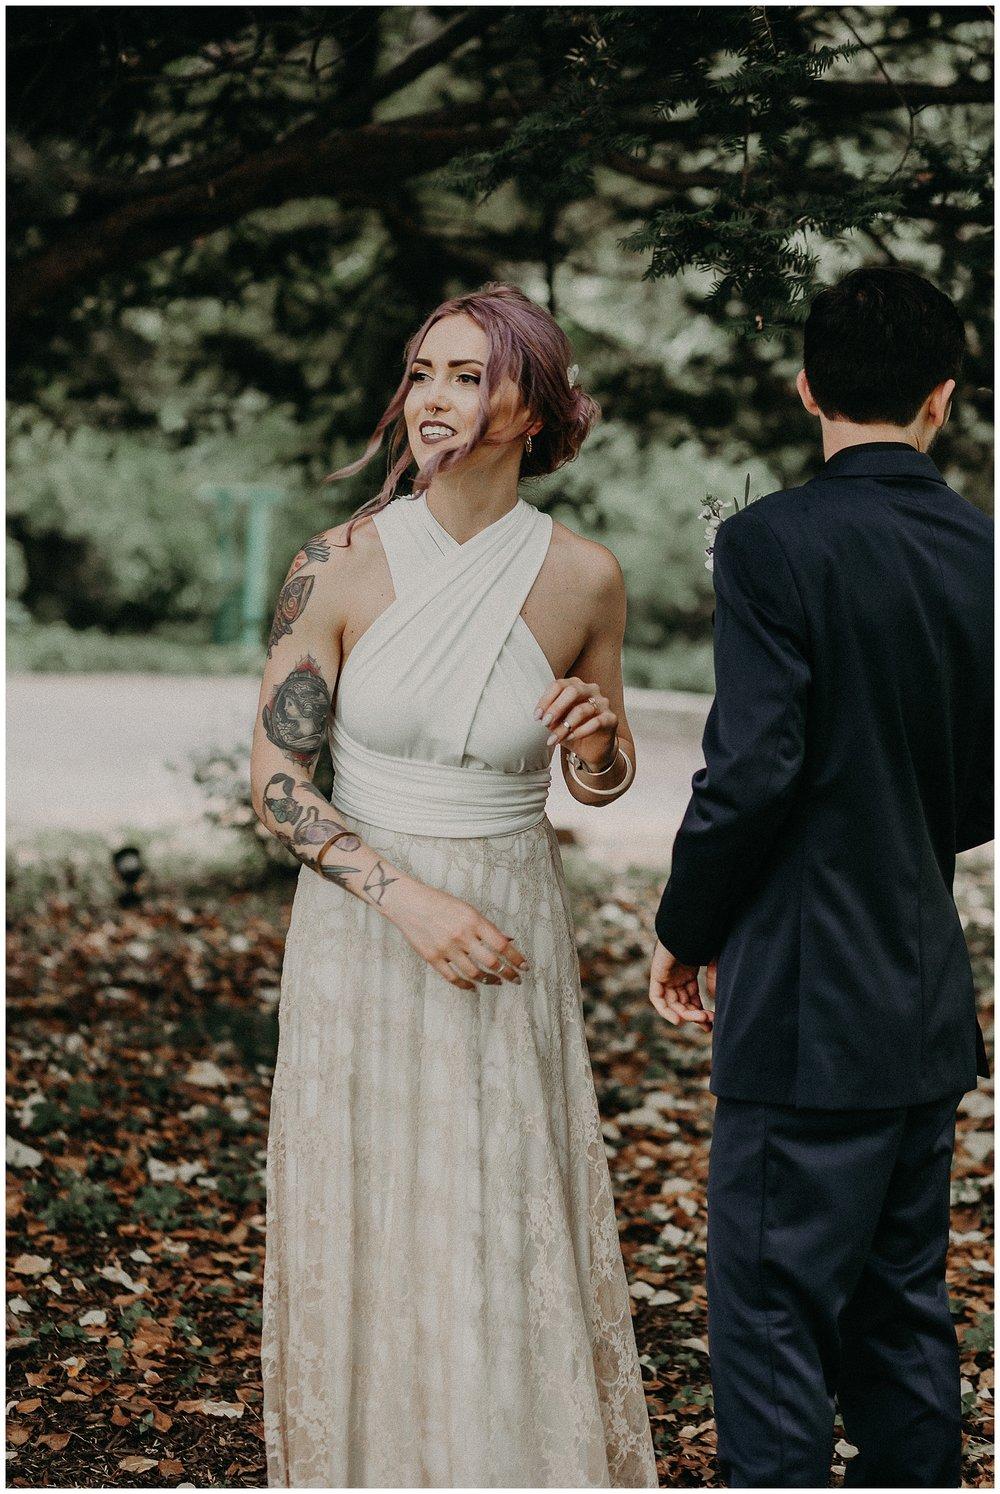 Outdoor Summer Boho Wedding at Ridgeland Manion in Downtown Philadelphia Pennsylvania_0080.jpg